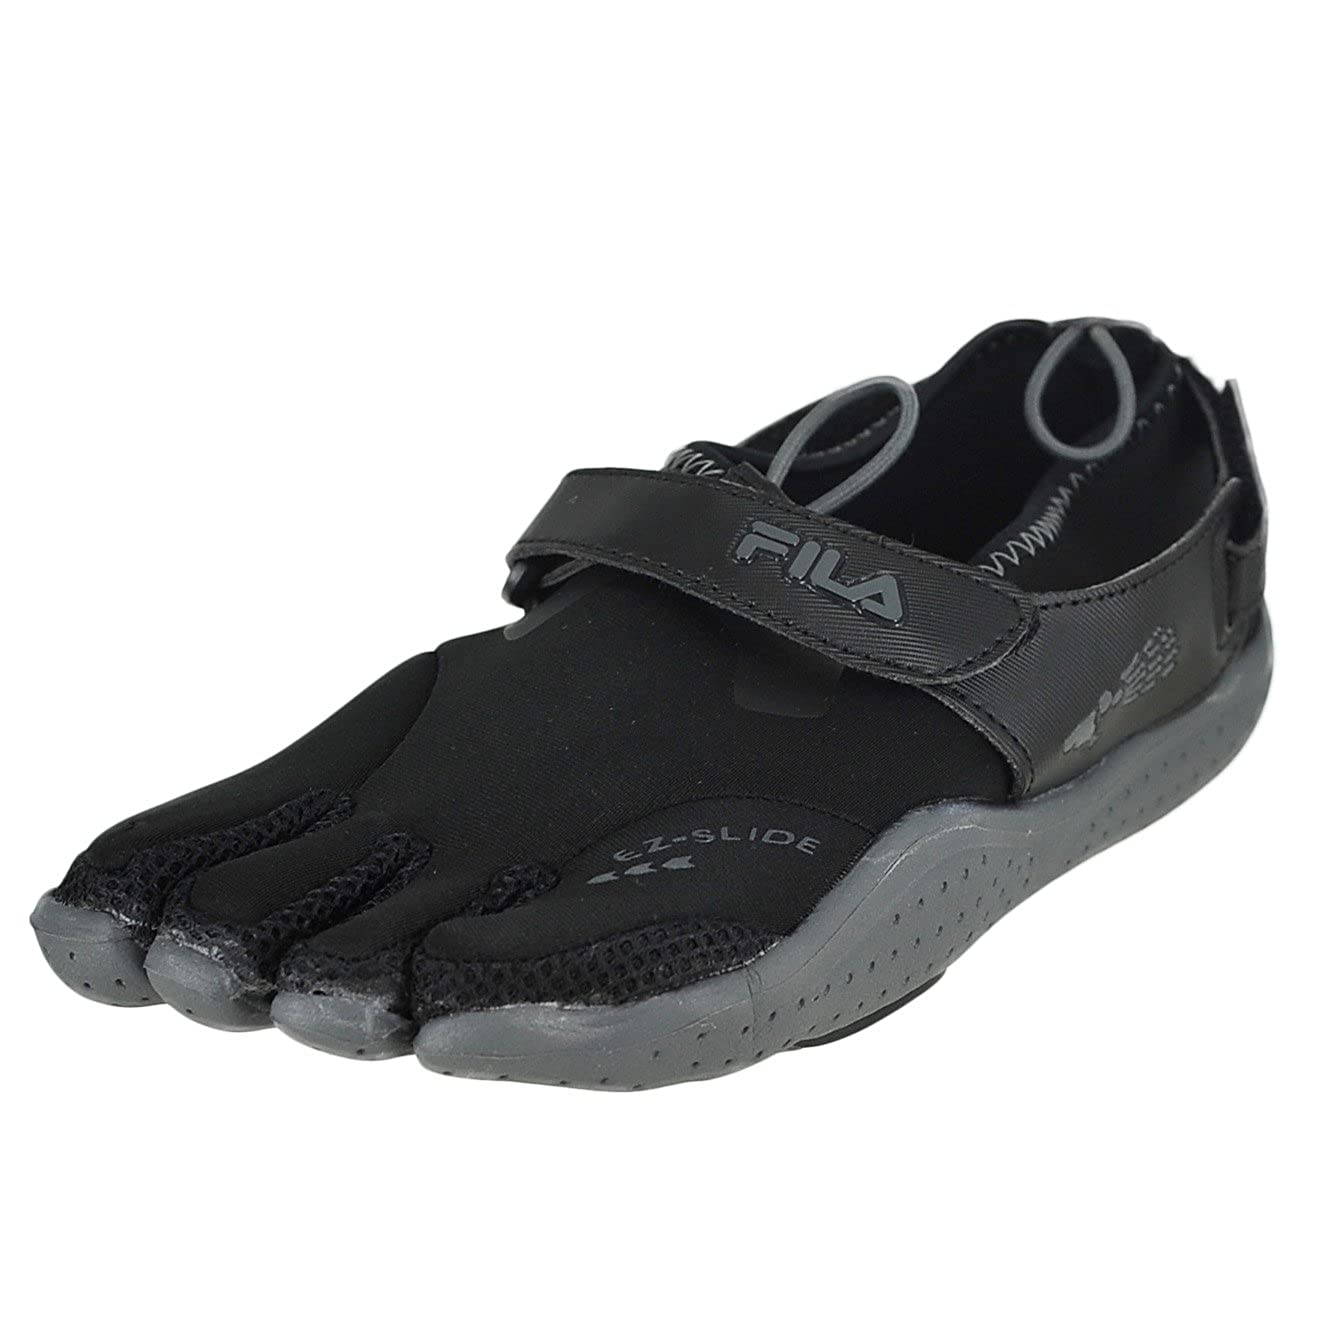 2a633fe8df Fila Women's Skeletoes: Amazon.co.uk: Shoes & Bags